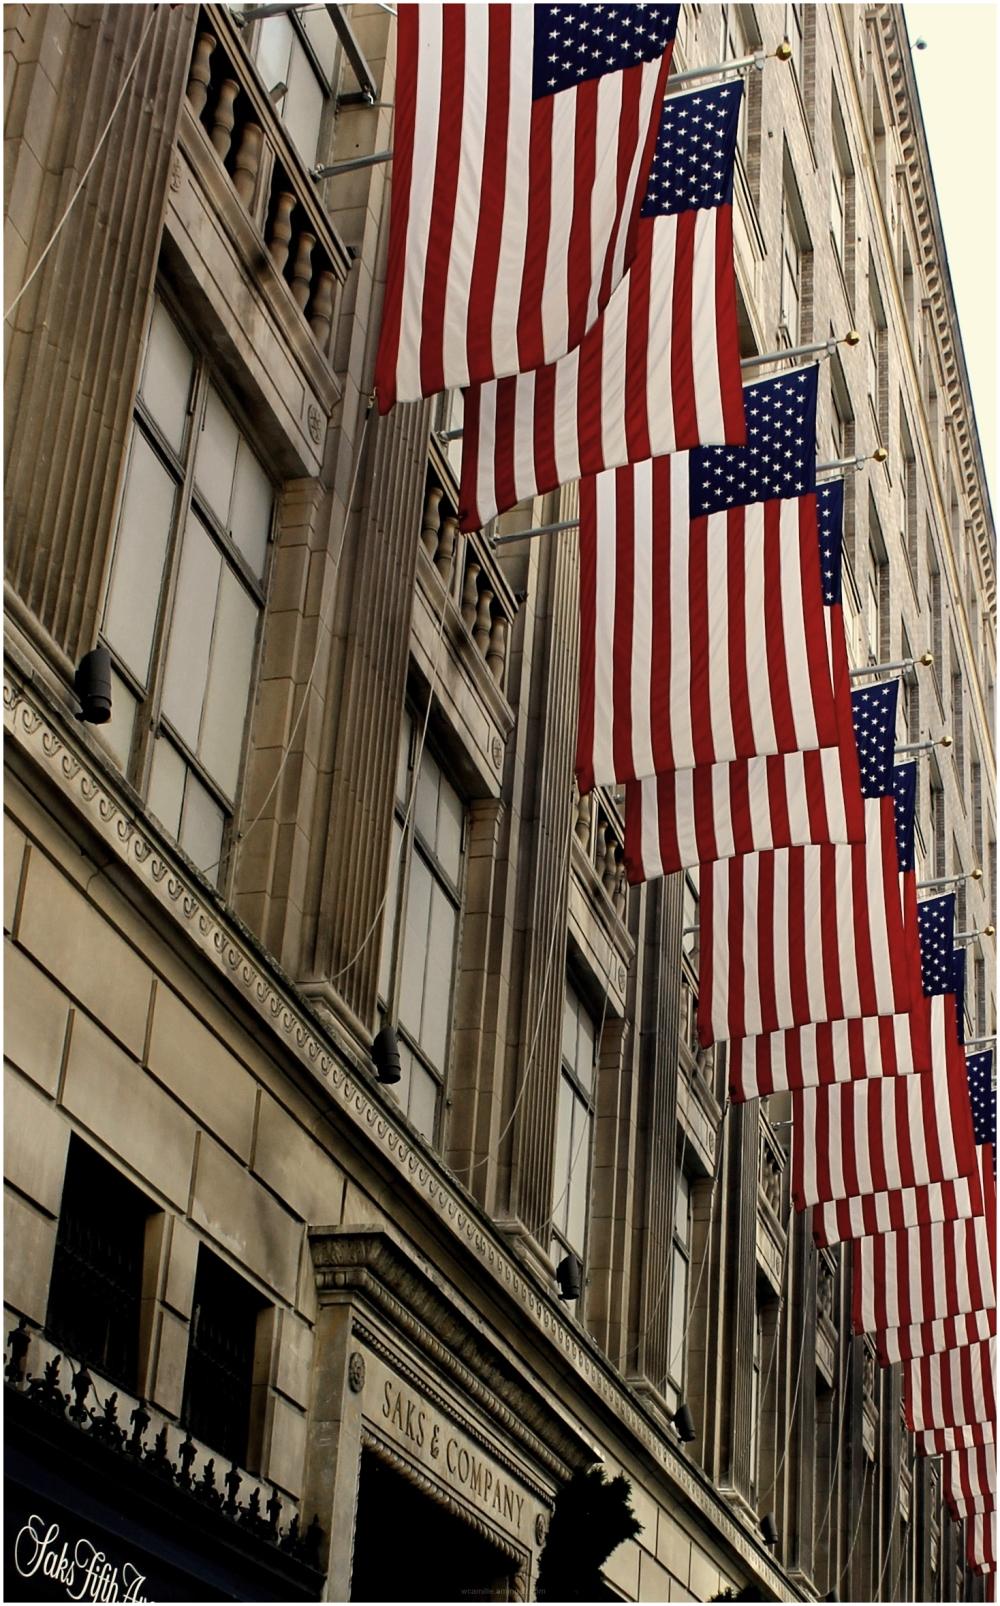 Saks, Fifth Avenue, New York, Retail, Flag, USA, B